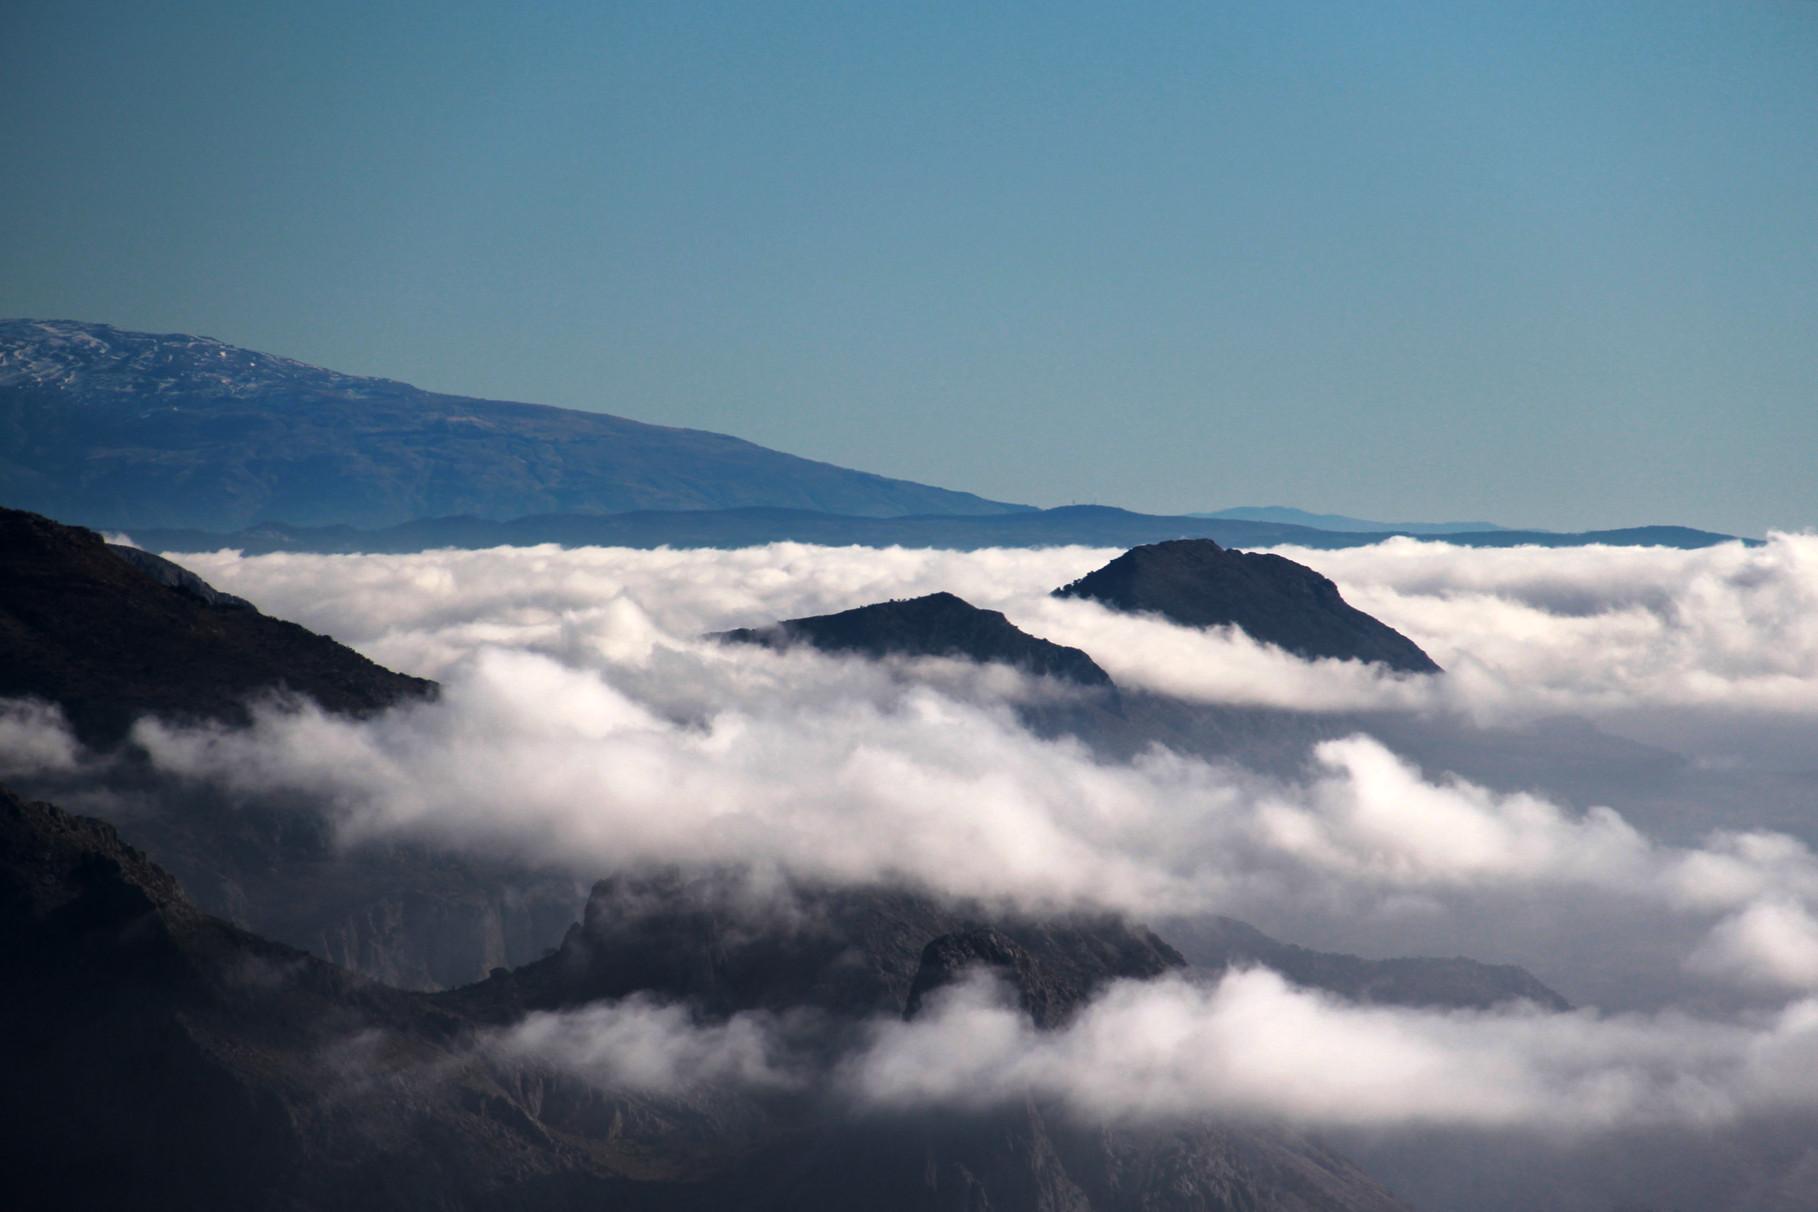 """Just above the Clouds"" - Sierra de Malaga - MC00003"